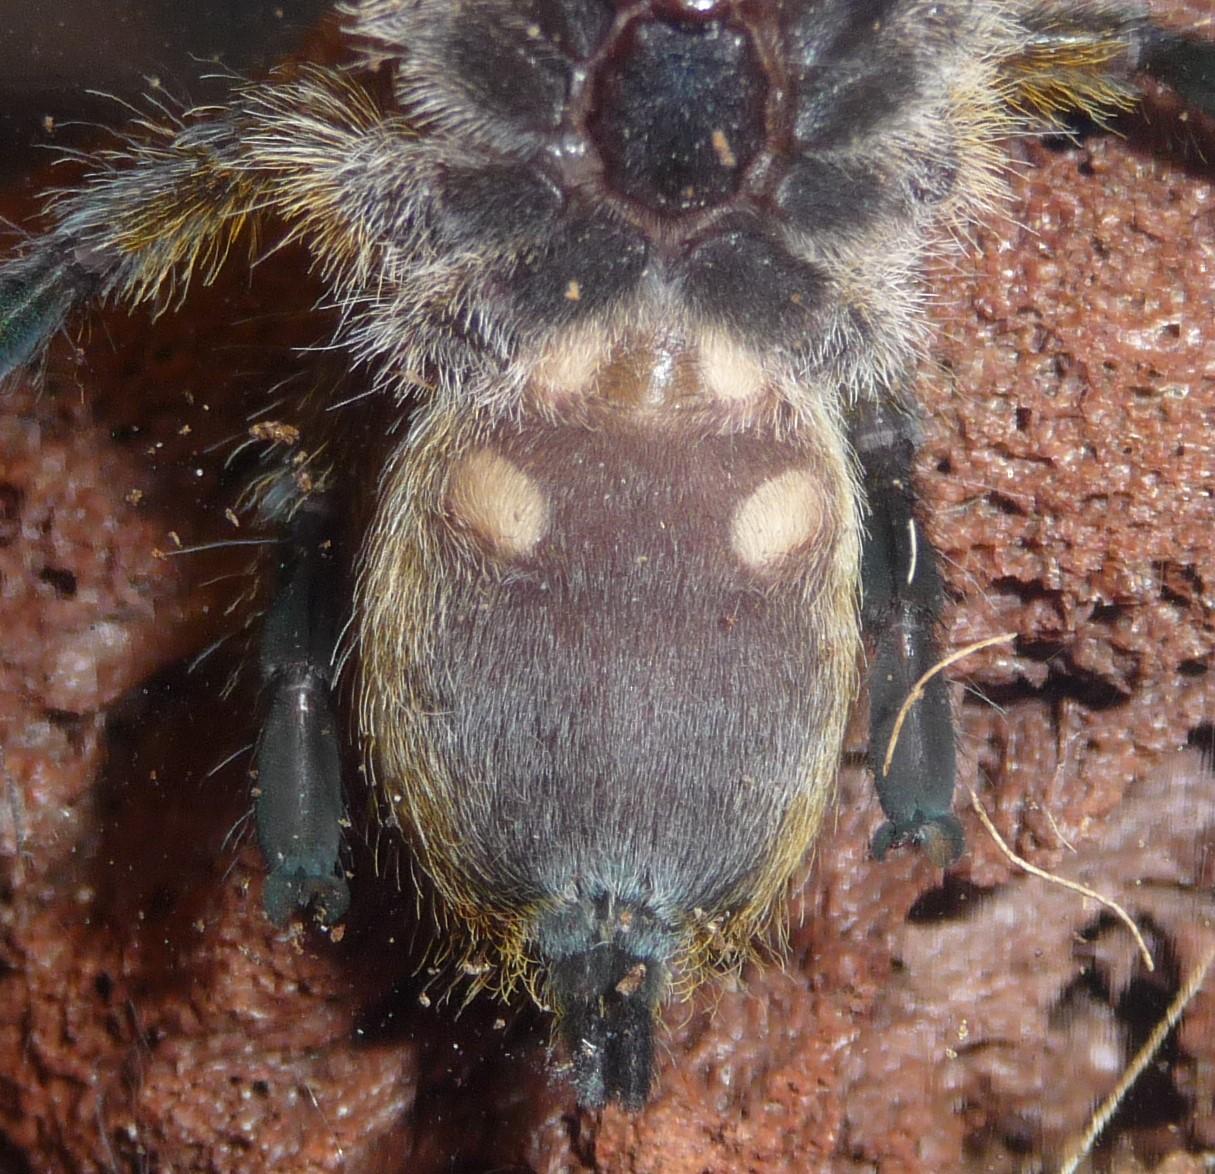 H. pulchripes.JPG